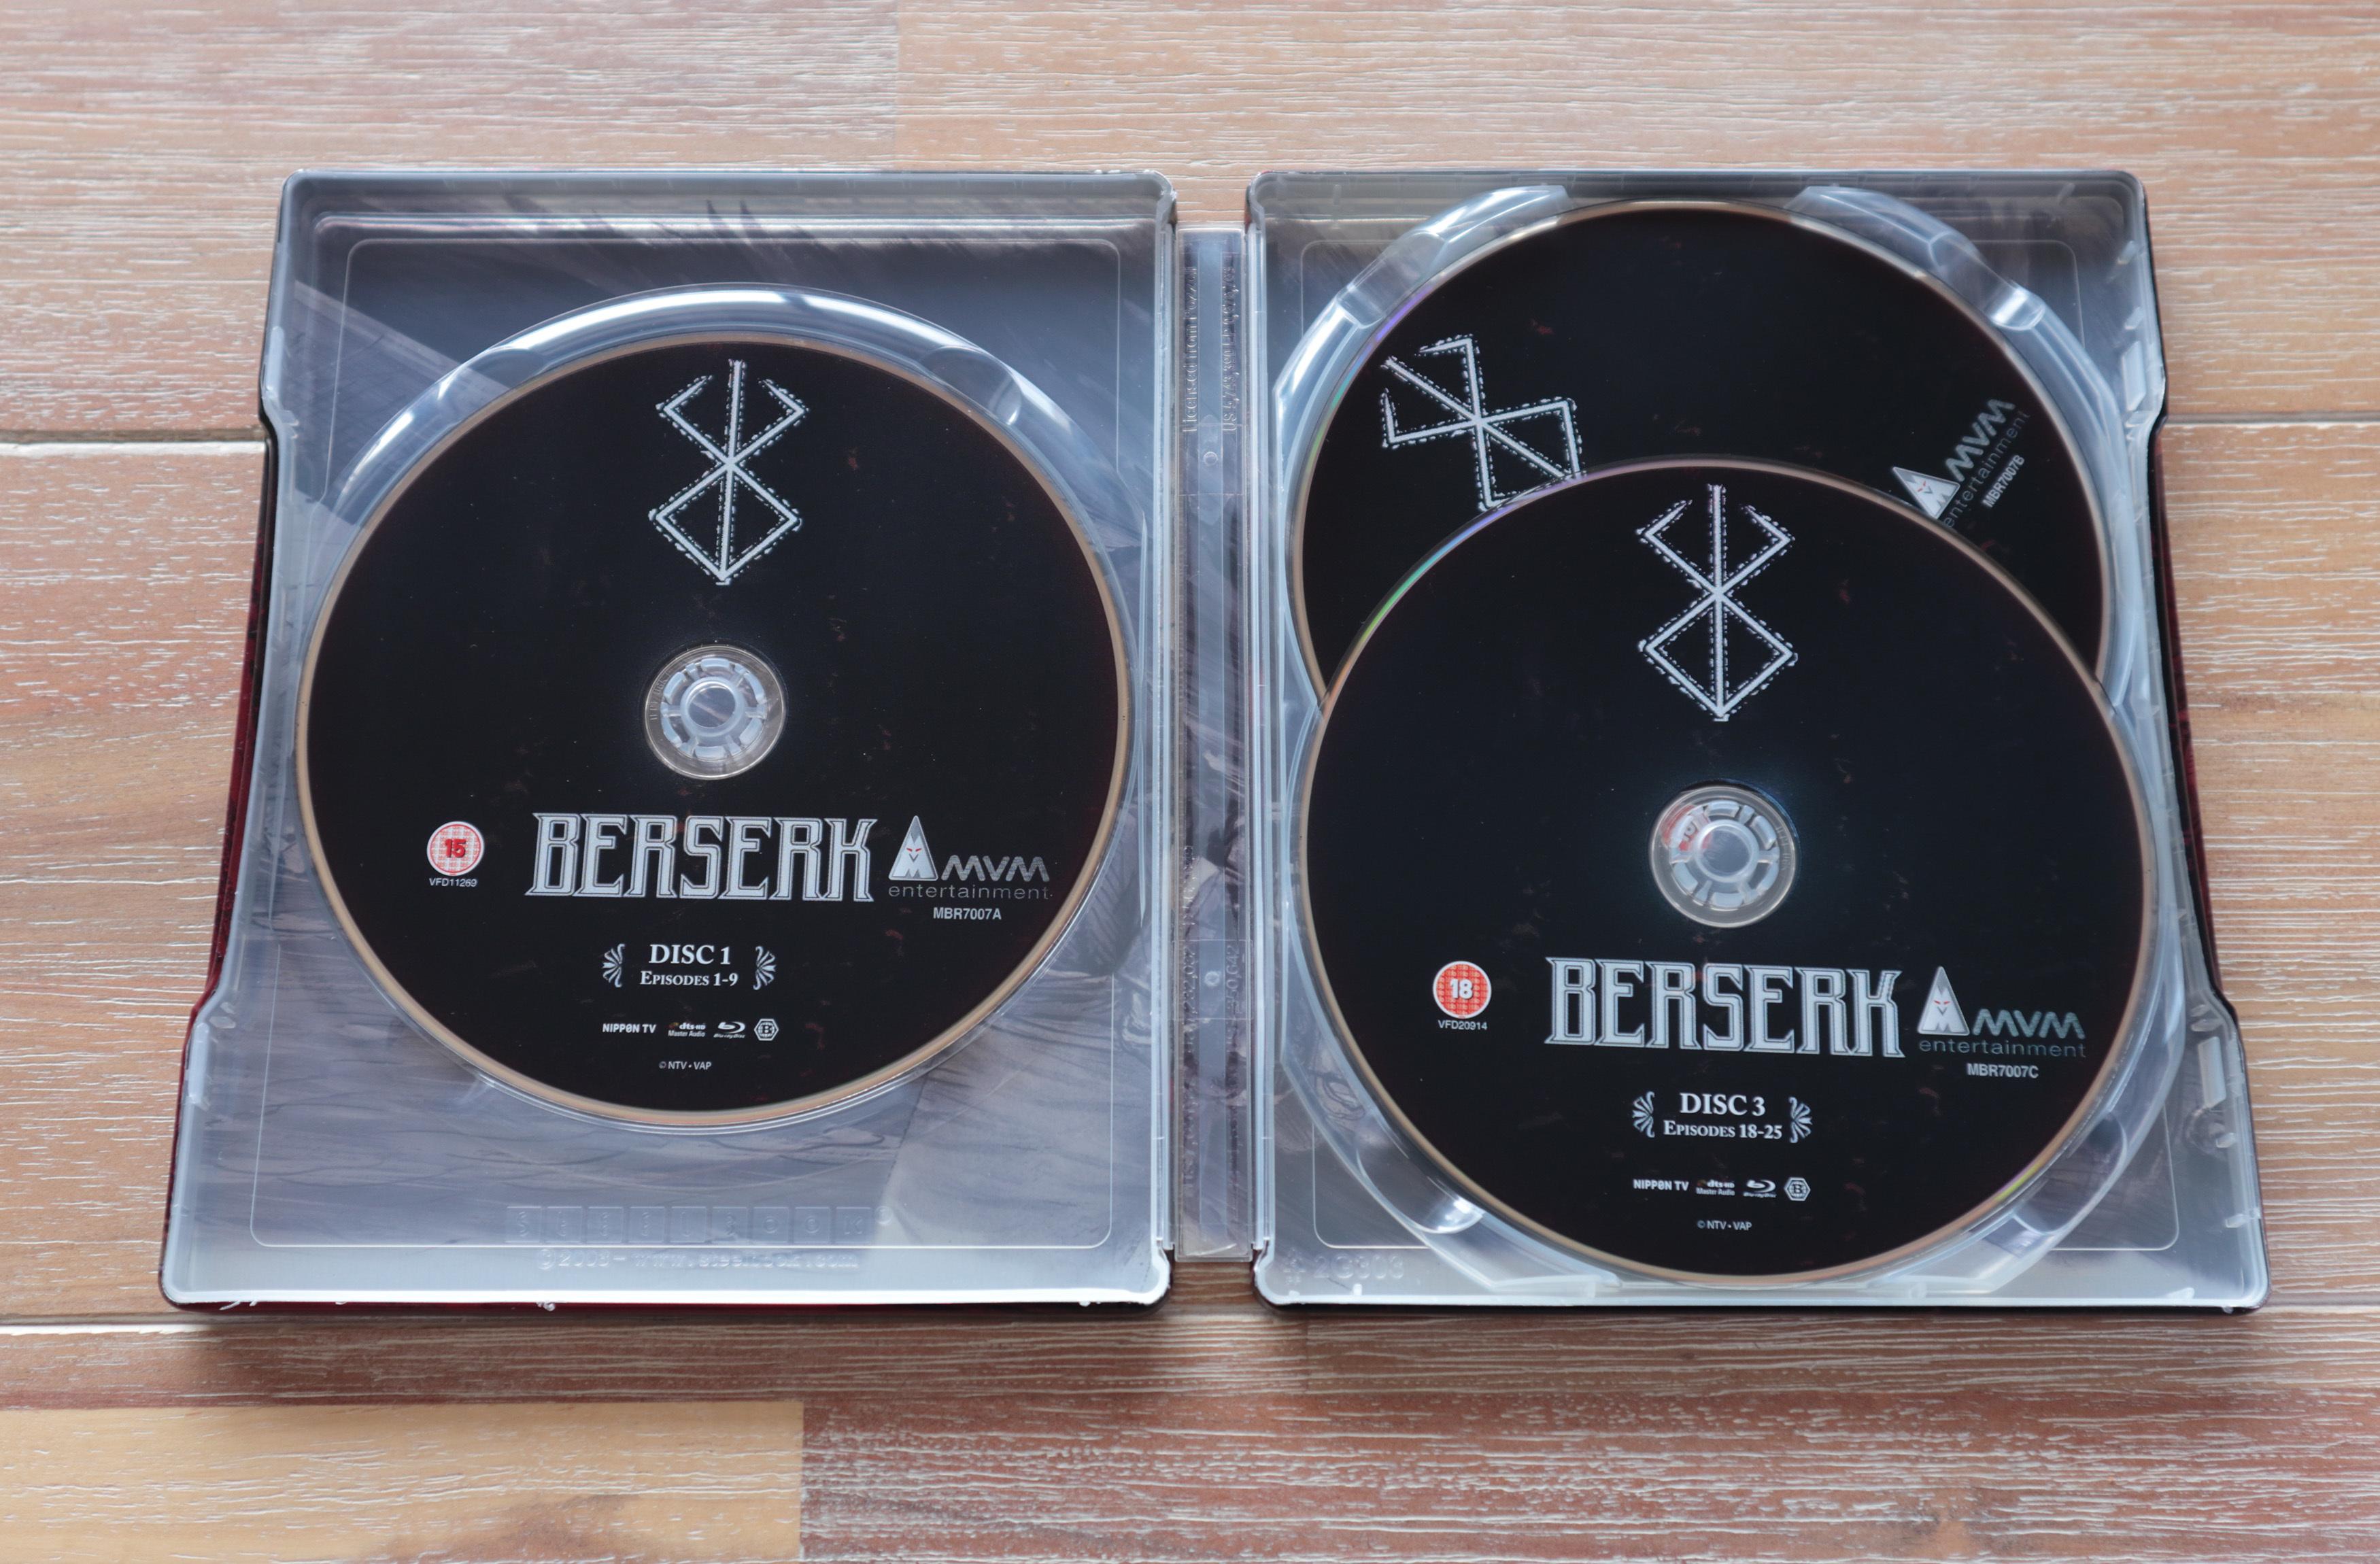 Berserk steelbook 剣風伝奇ベルセルク UK イギリス スチールブック